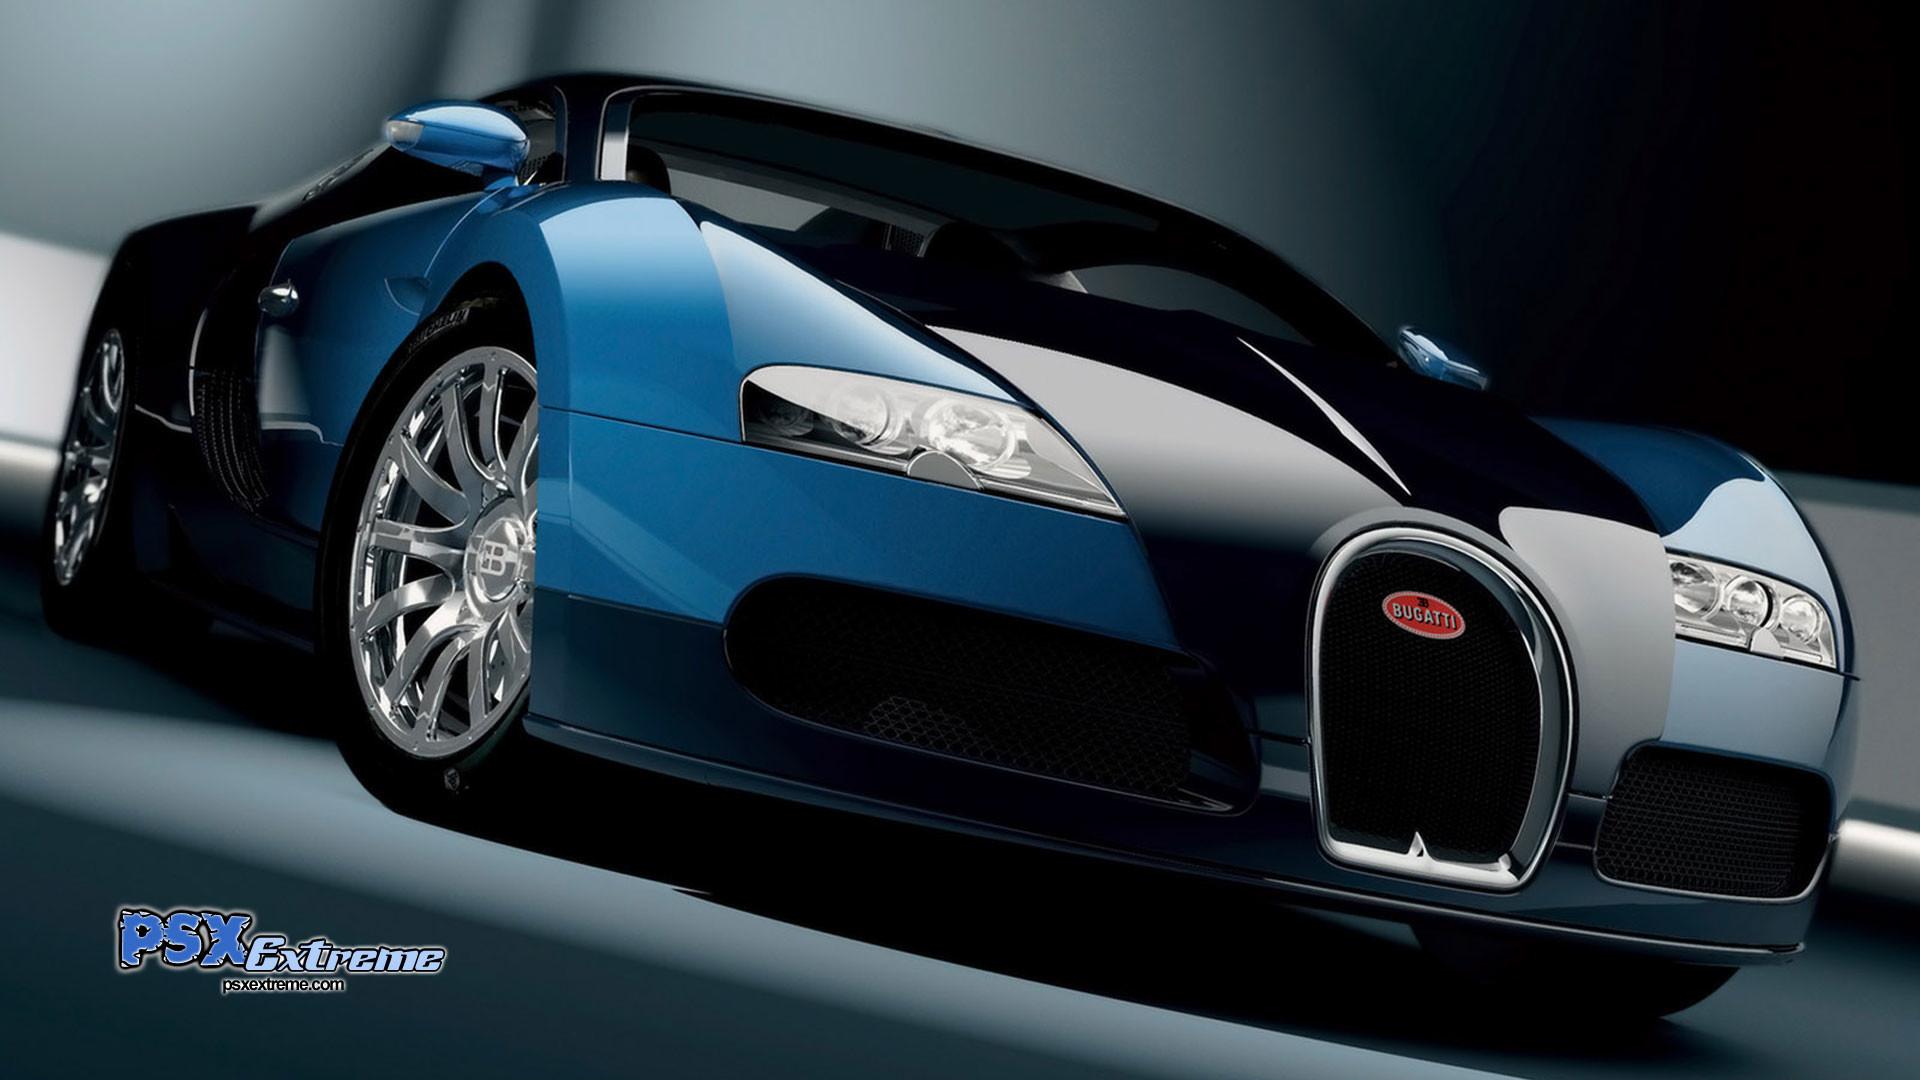 Exceptionnel Bugatti Veyron 9